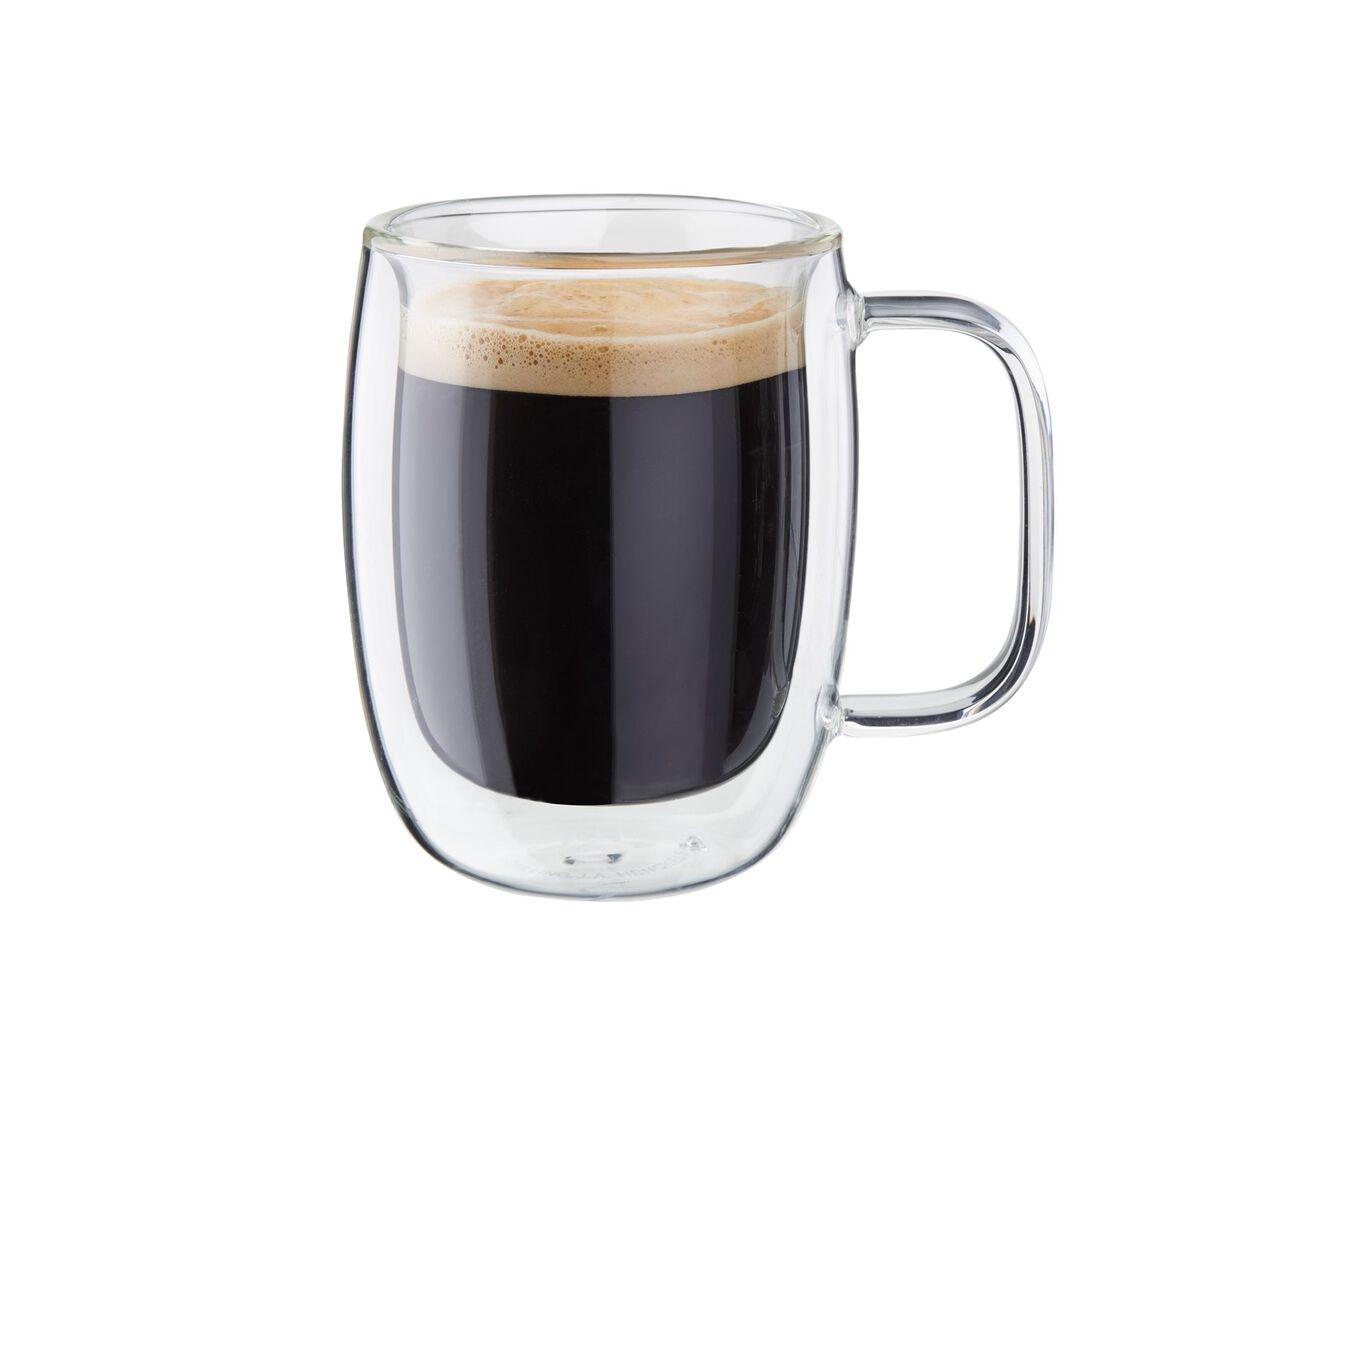 2-pc Espresso glass set, Double wall glas ,,large 1